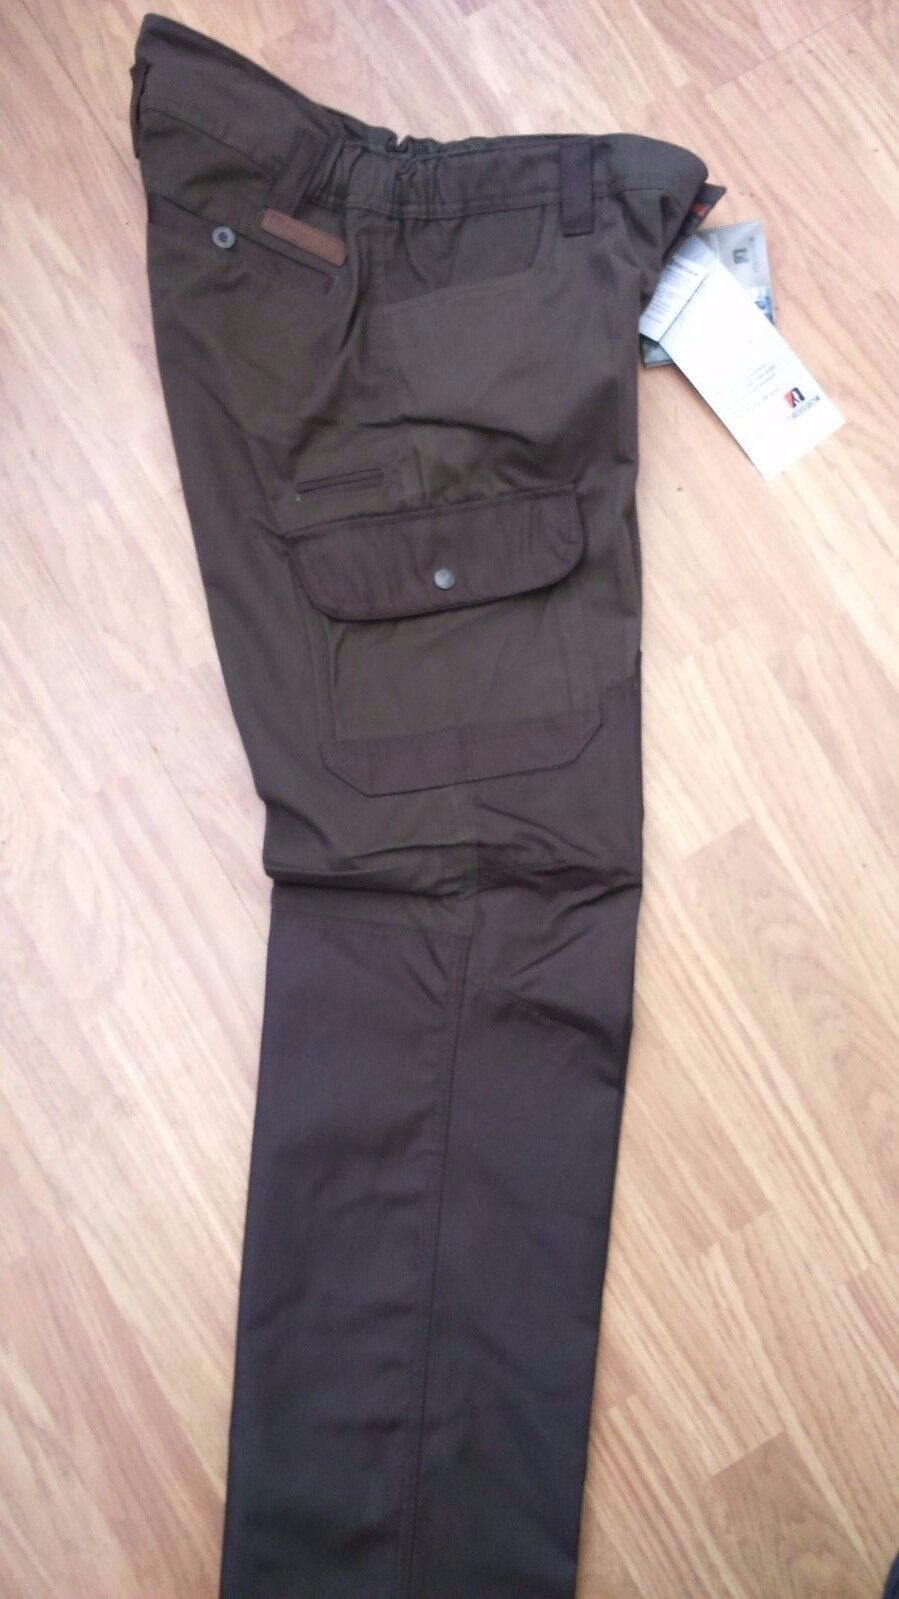 Percussion Showerproof Bush Trousers 1033 Ideal for Hunting,Fishing,Walking